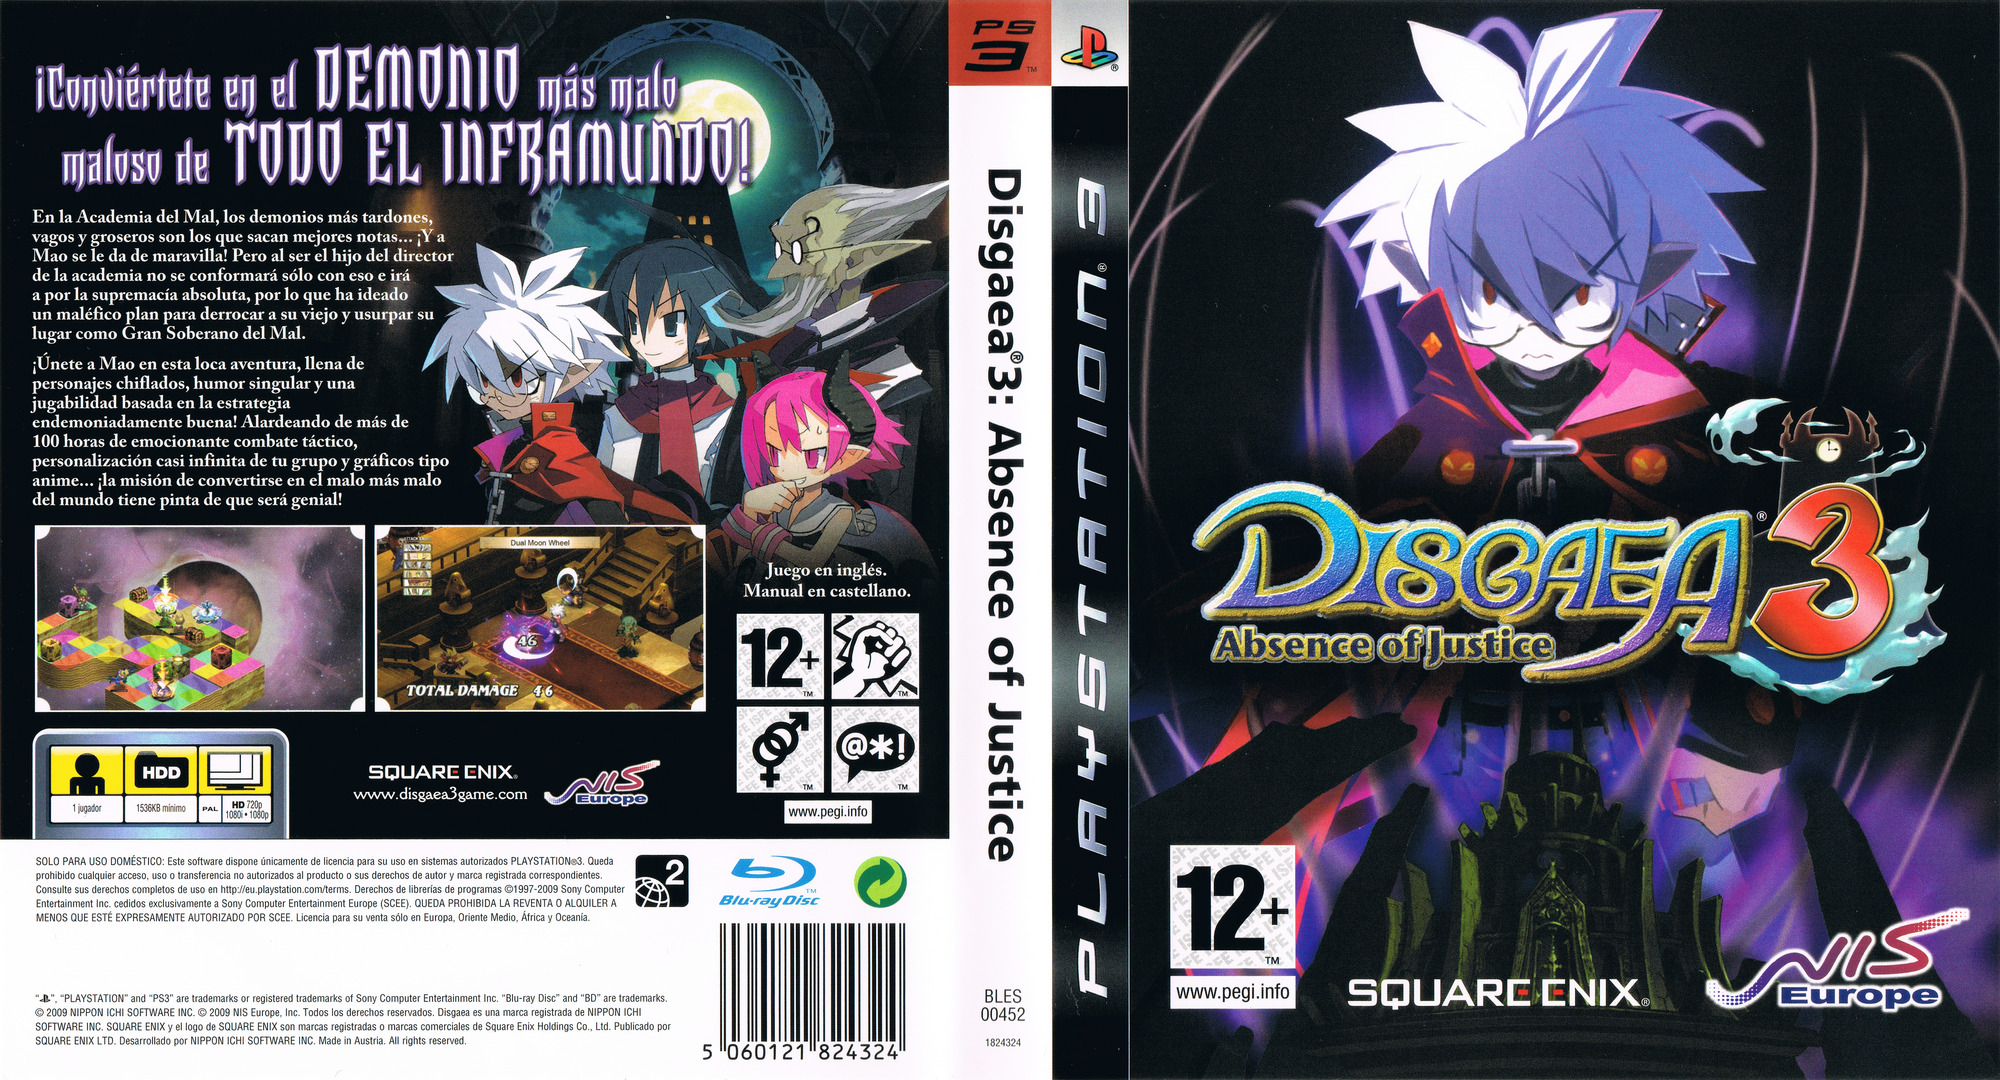 PS3 coverfullHQ (BLES00452)